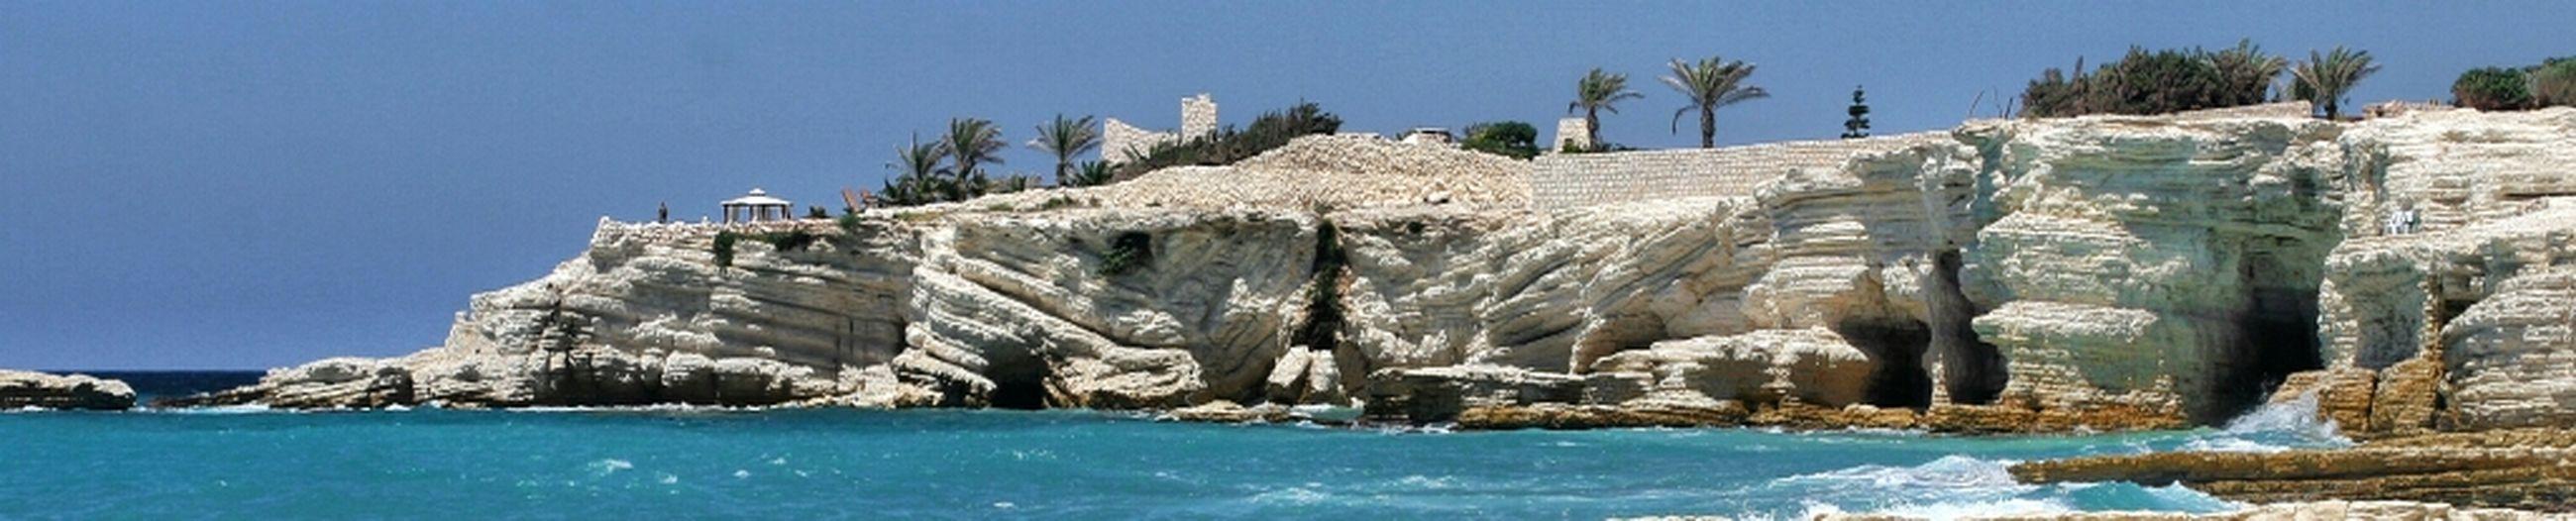 Seaside Rocks Syria  Cave Latakia